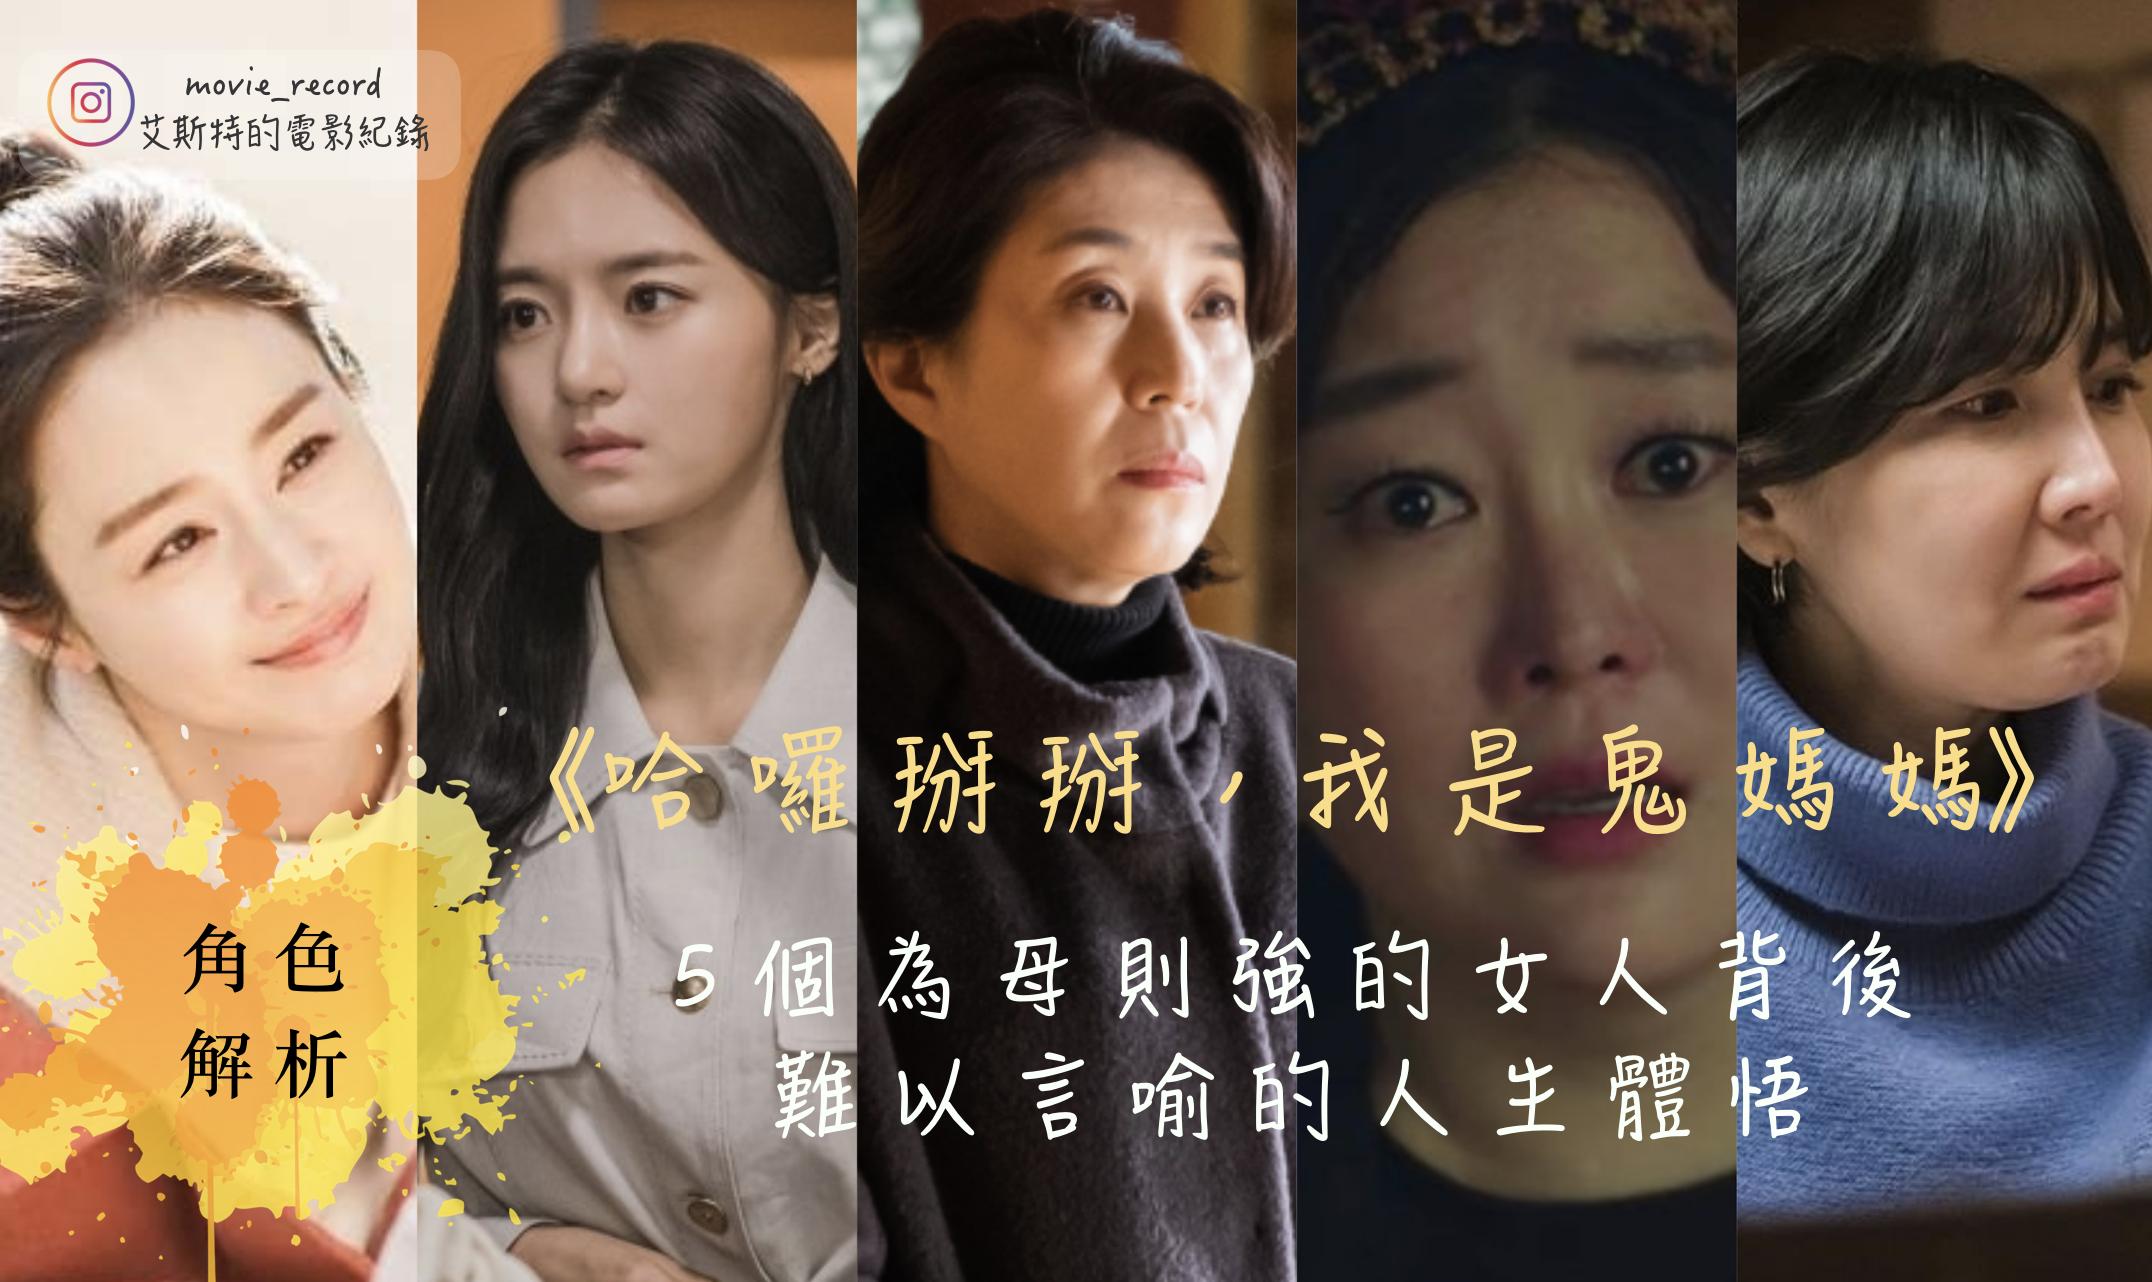 ♣ NEW最新文章:艾韓劇 · Netflix《哈囉掰掰,我是鬼媽媽》角色解析- 5個為母則強的女人背後,難以言喻的人生體悟